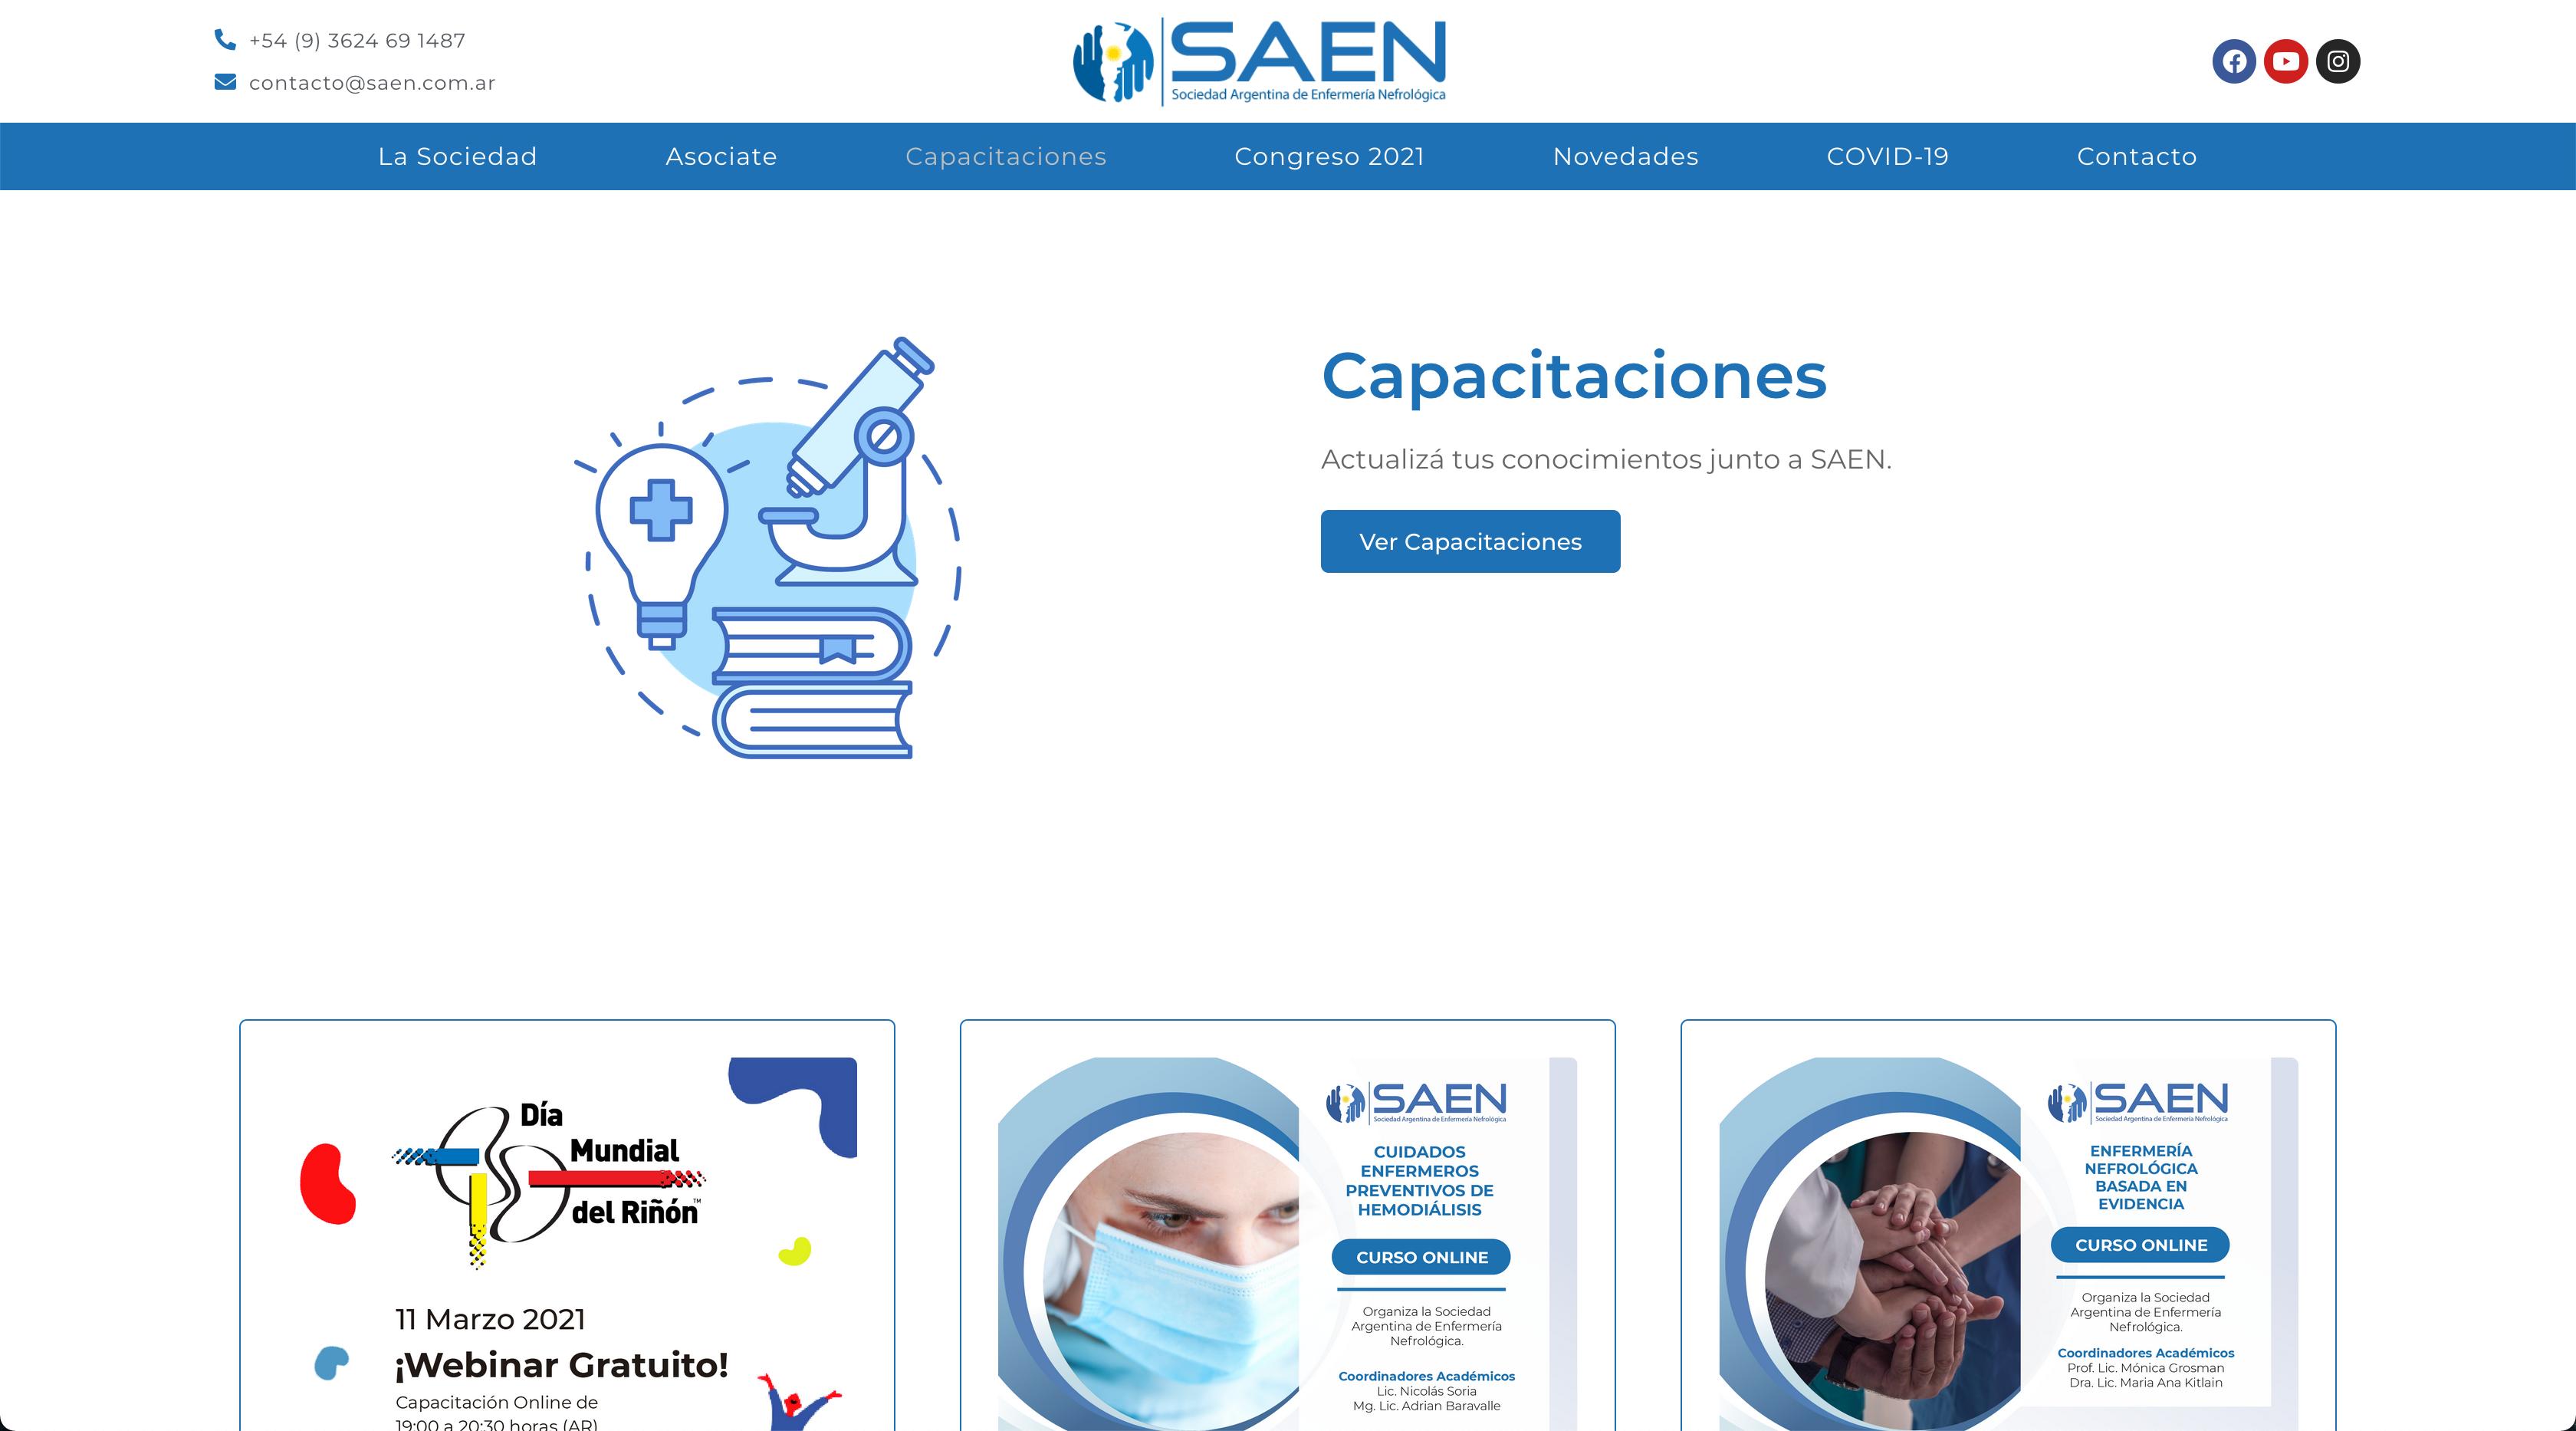 saen-sociedad-argentina-de-enfermeria-nefrologica-online-lab-web-development-web-design-9